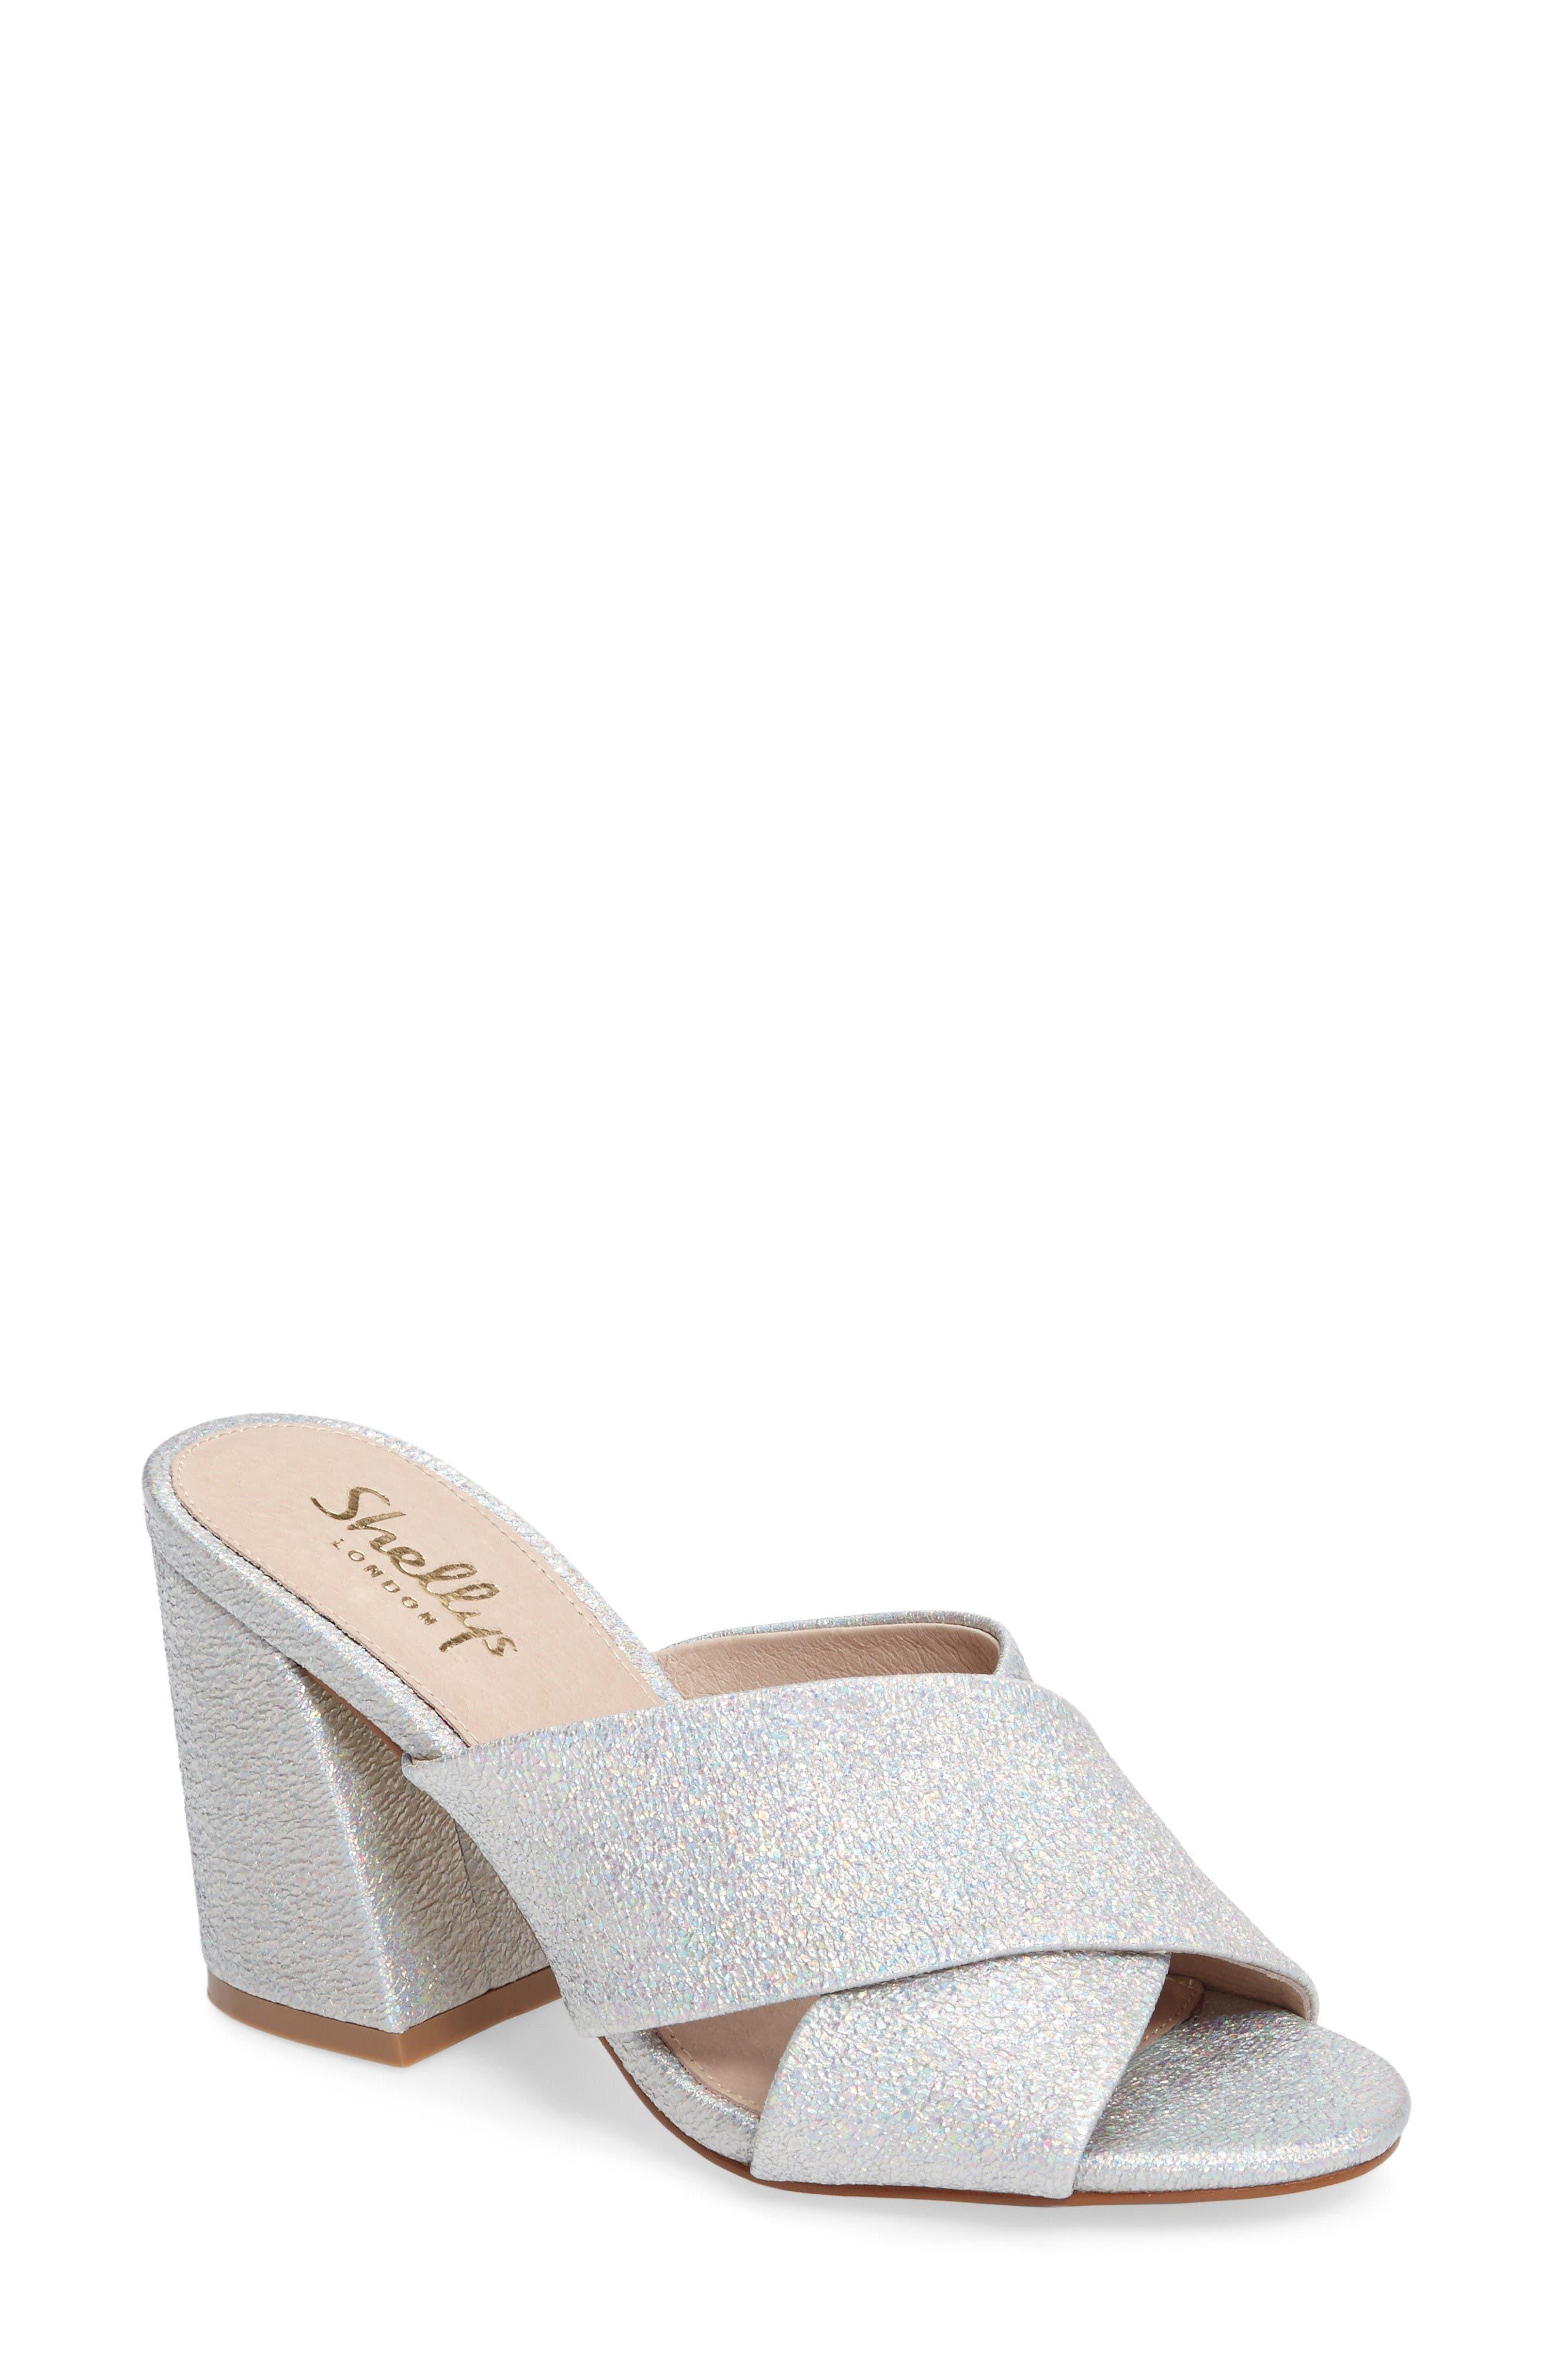 Shellys London Dani Block Heel Sandal (Women)